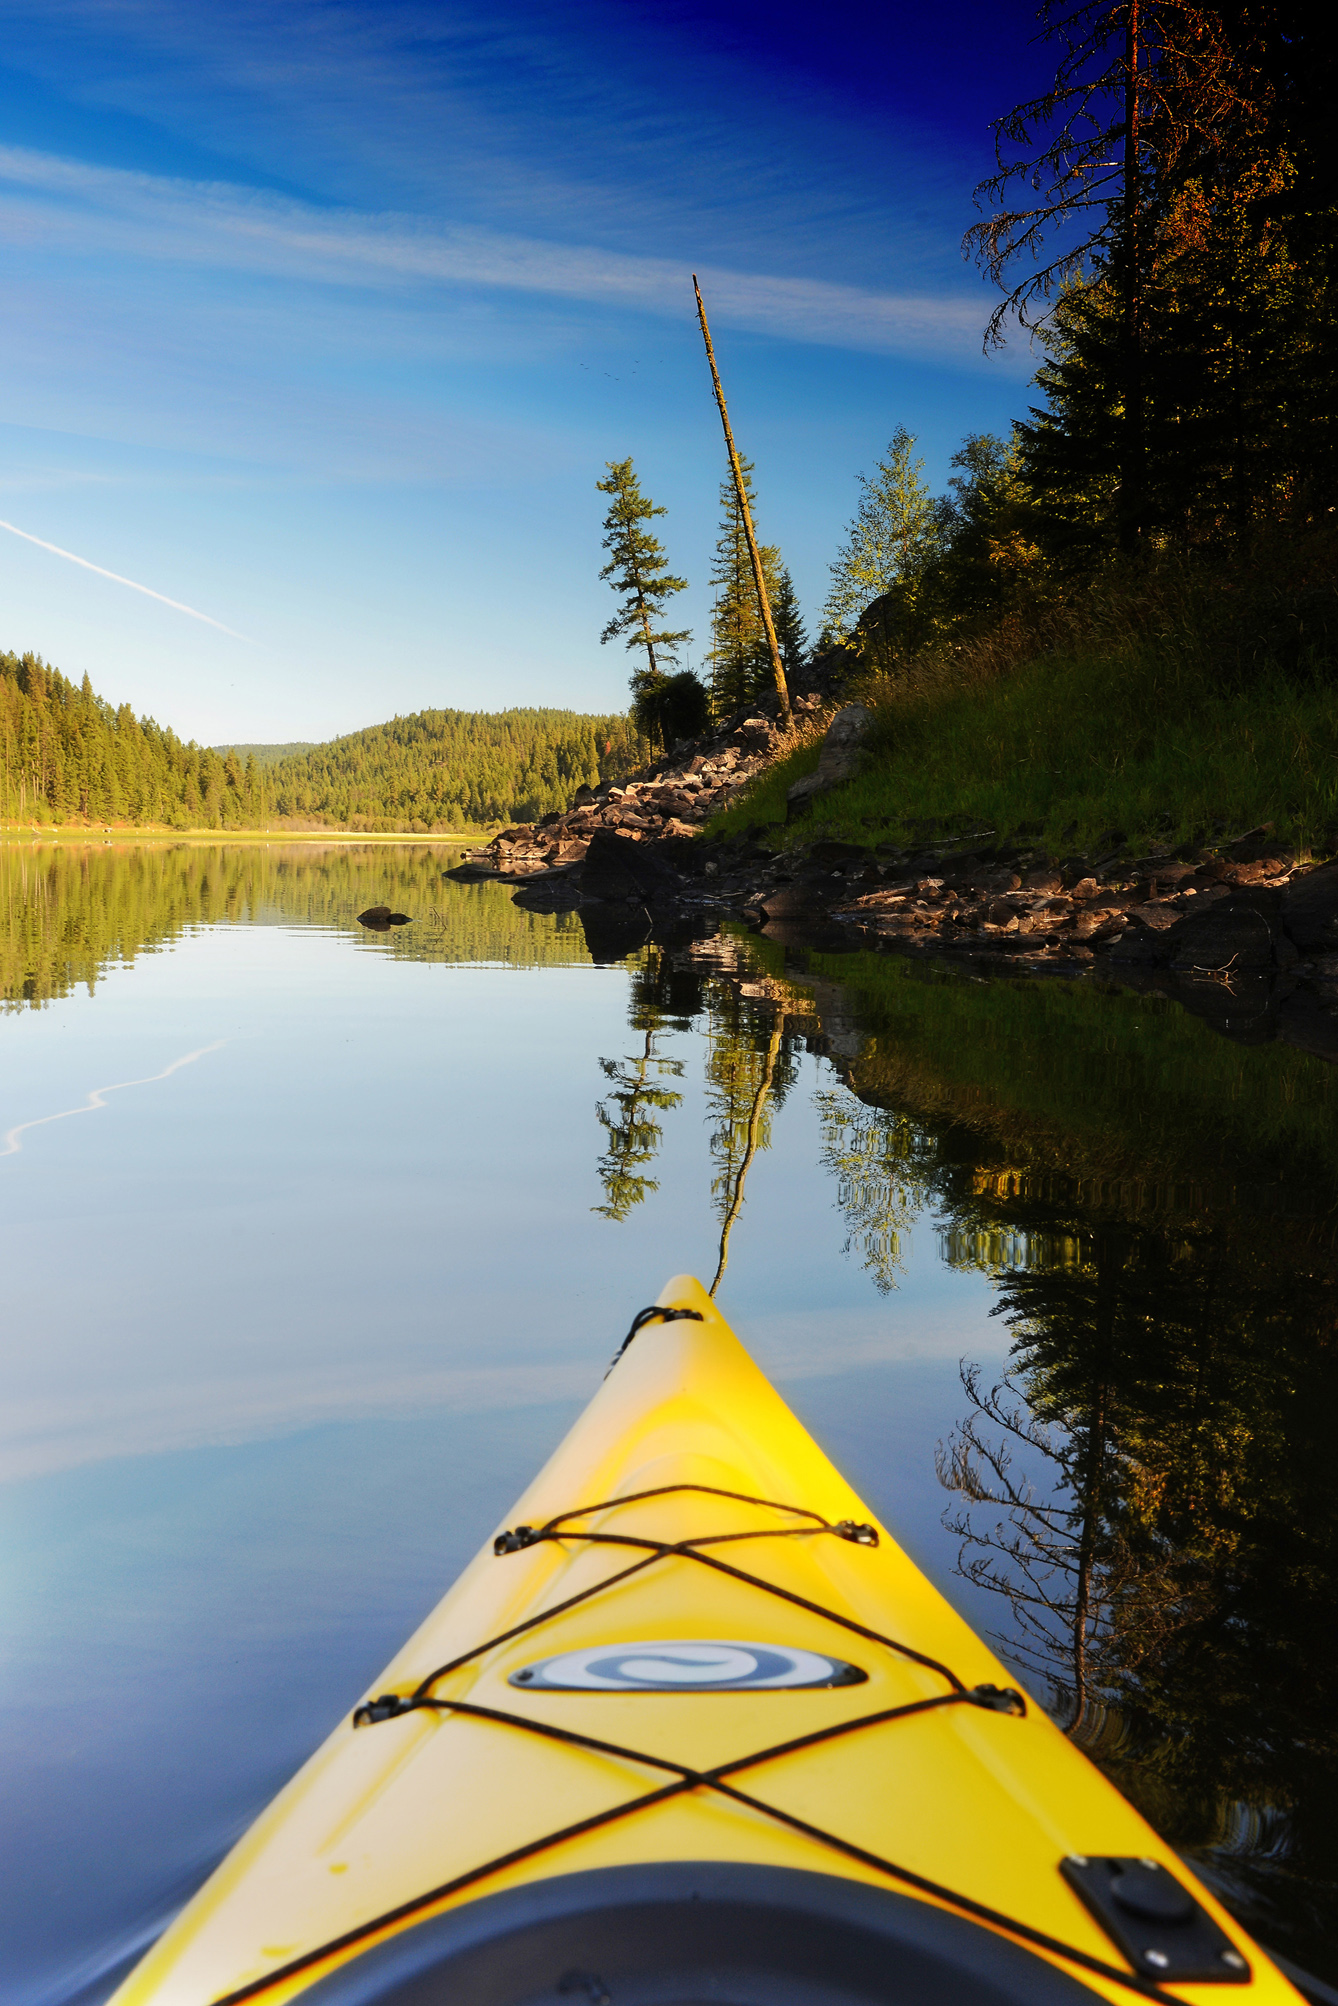 Kayak-Respite-at-Bayley-LakeJC-copy